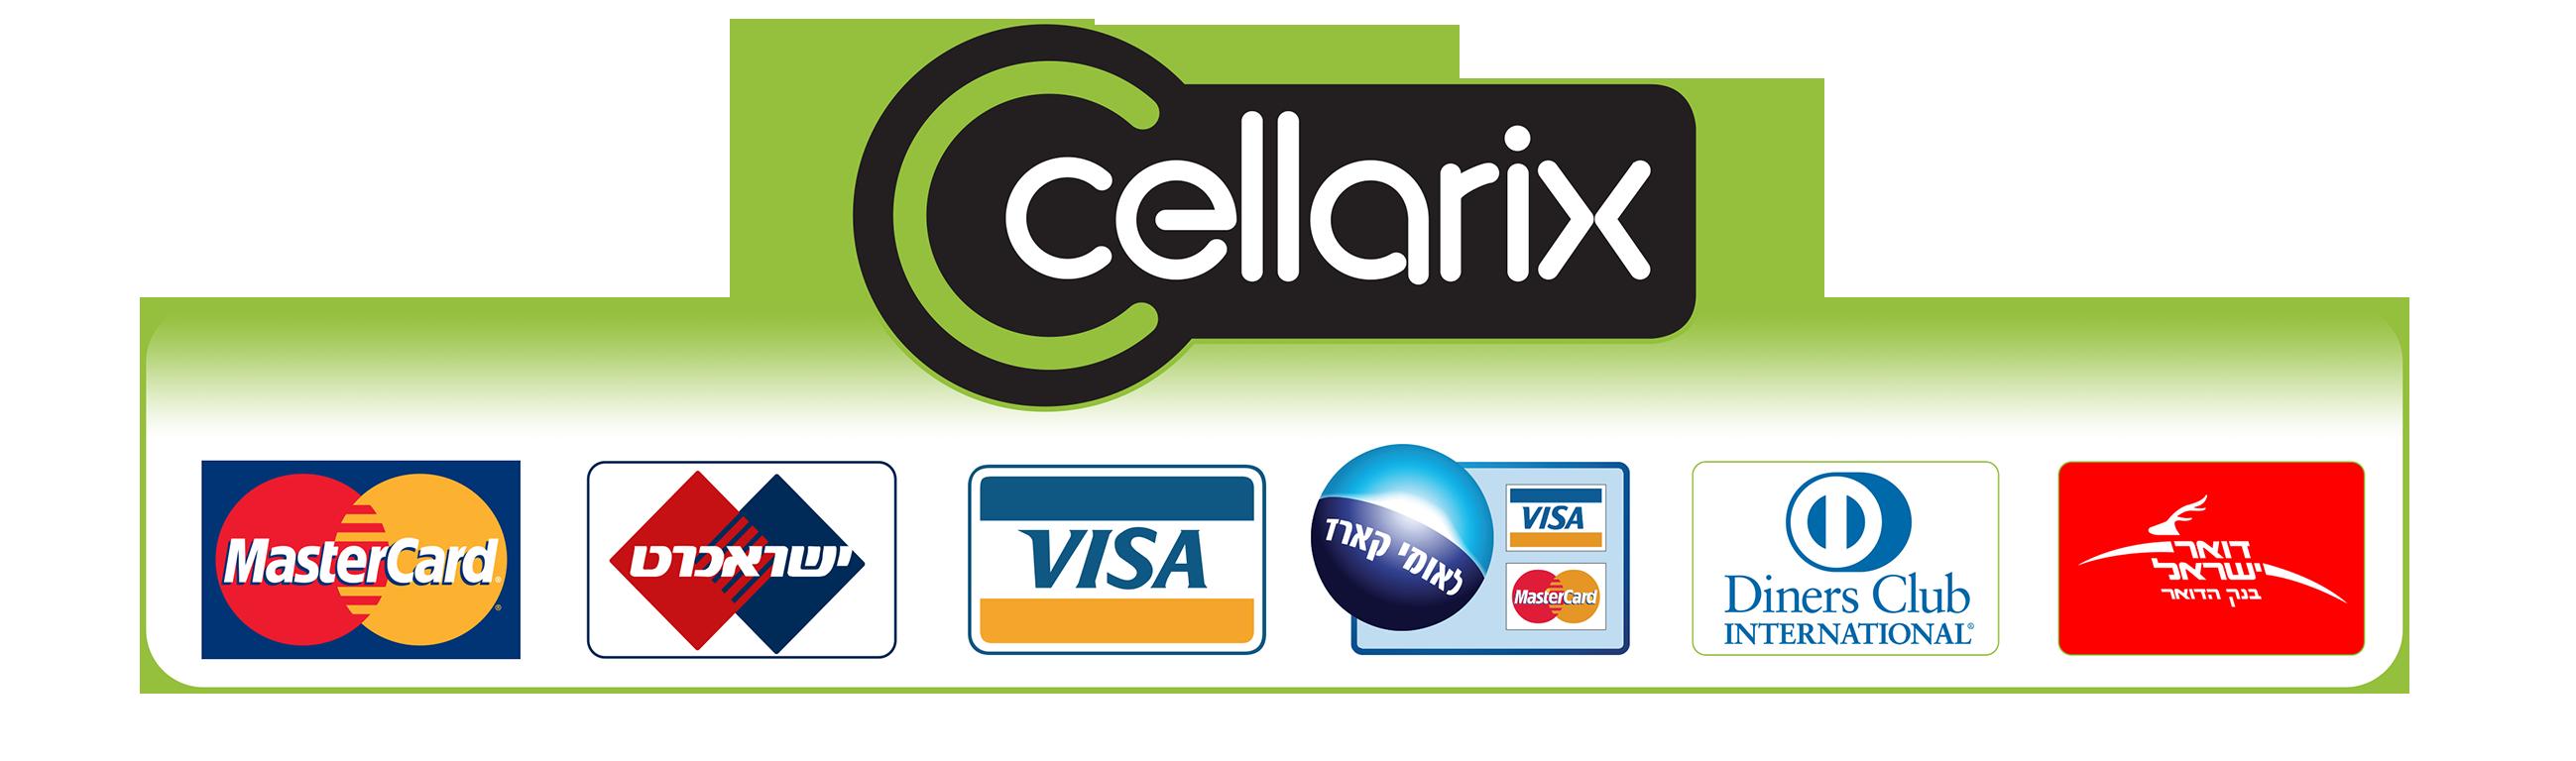 cellarix